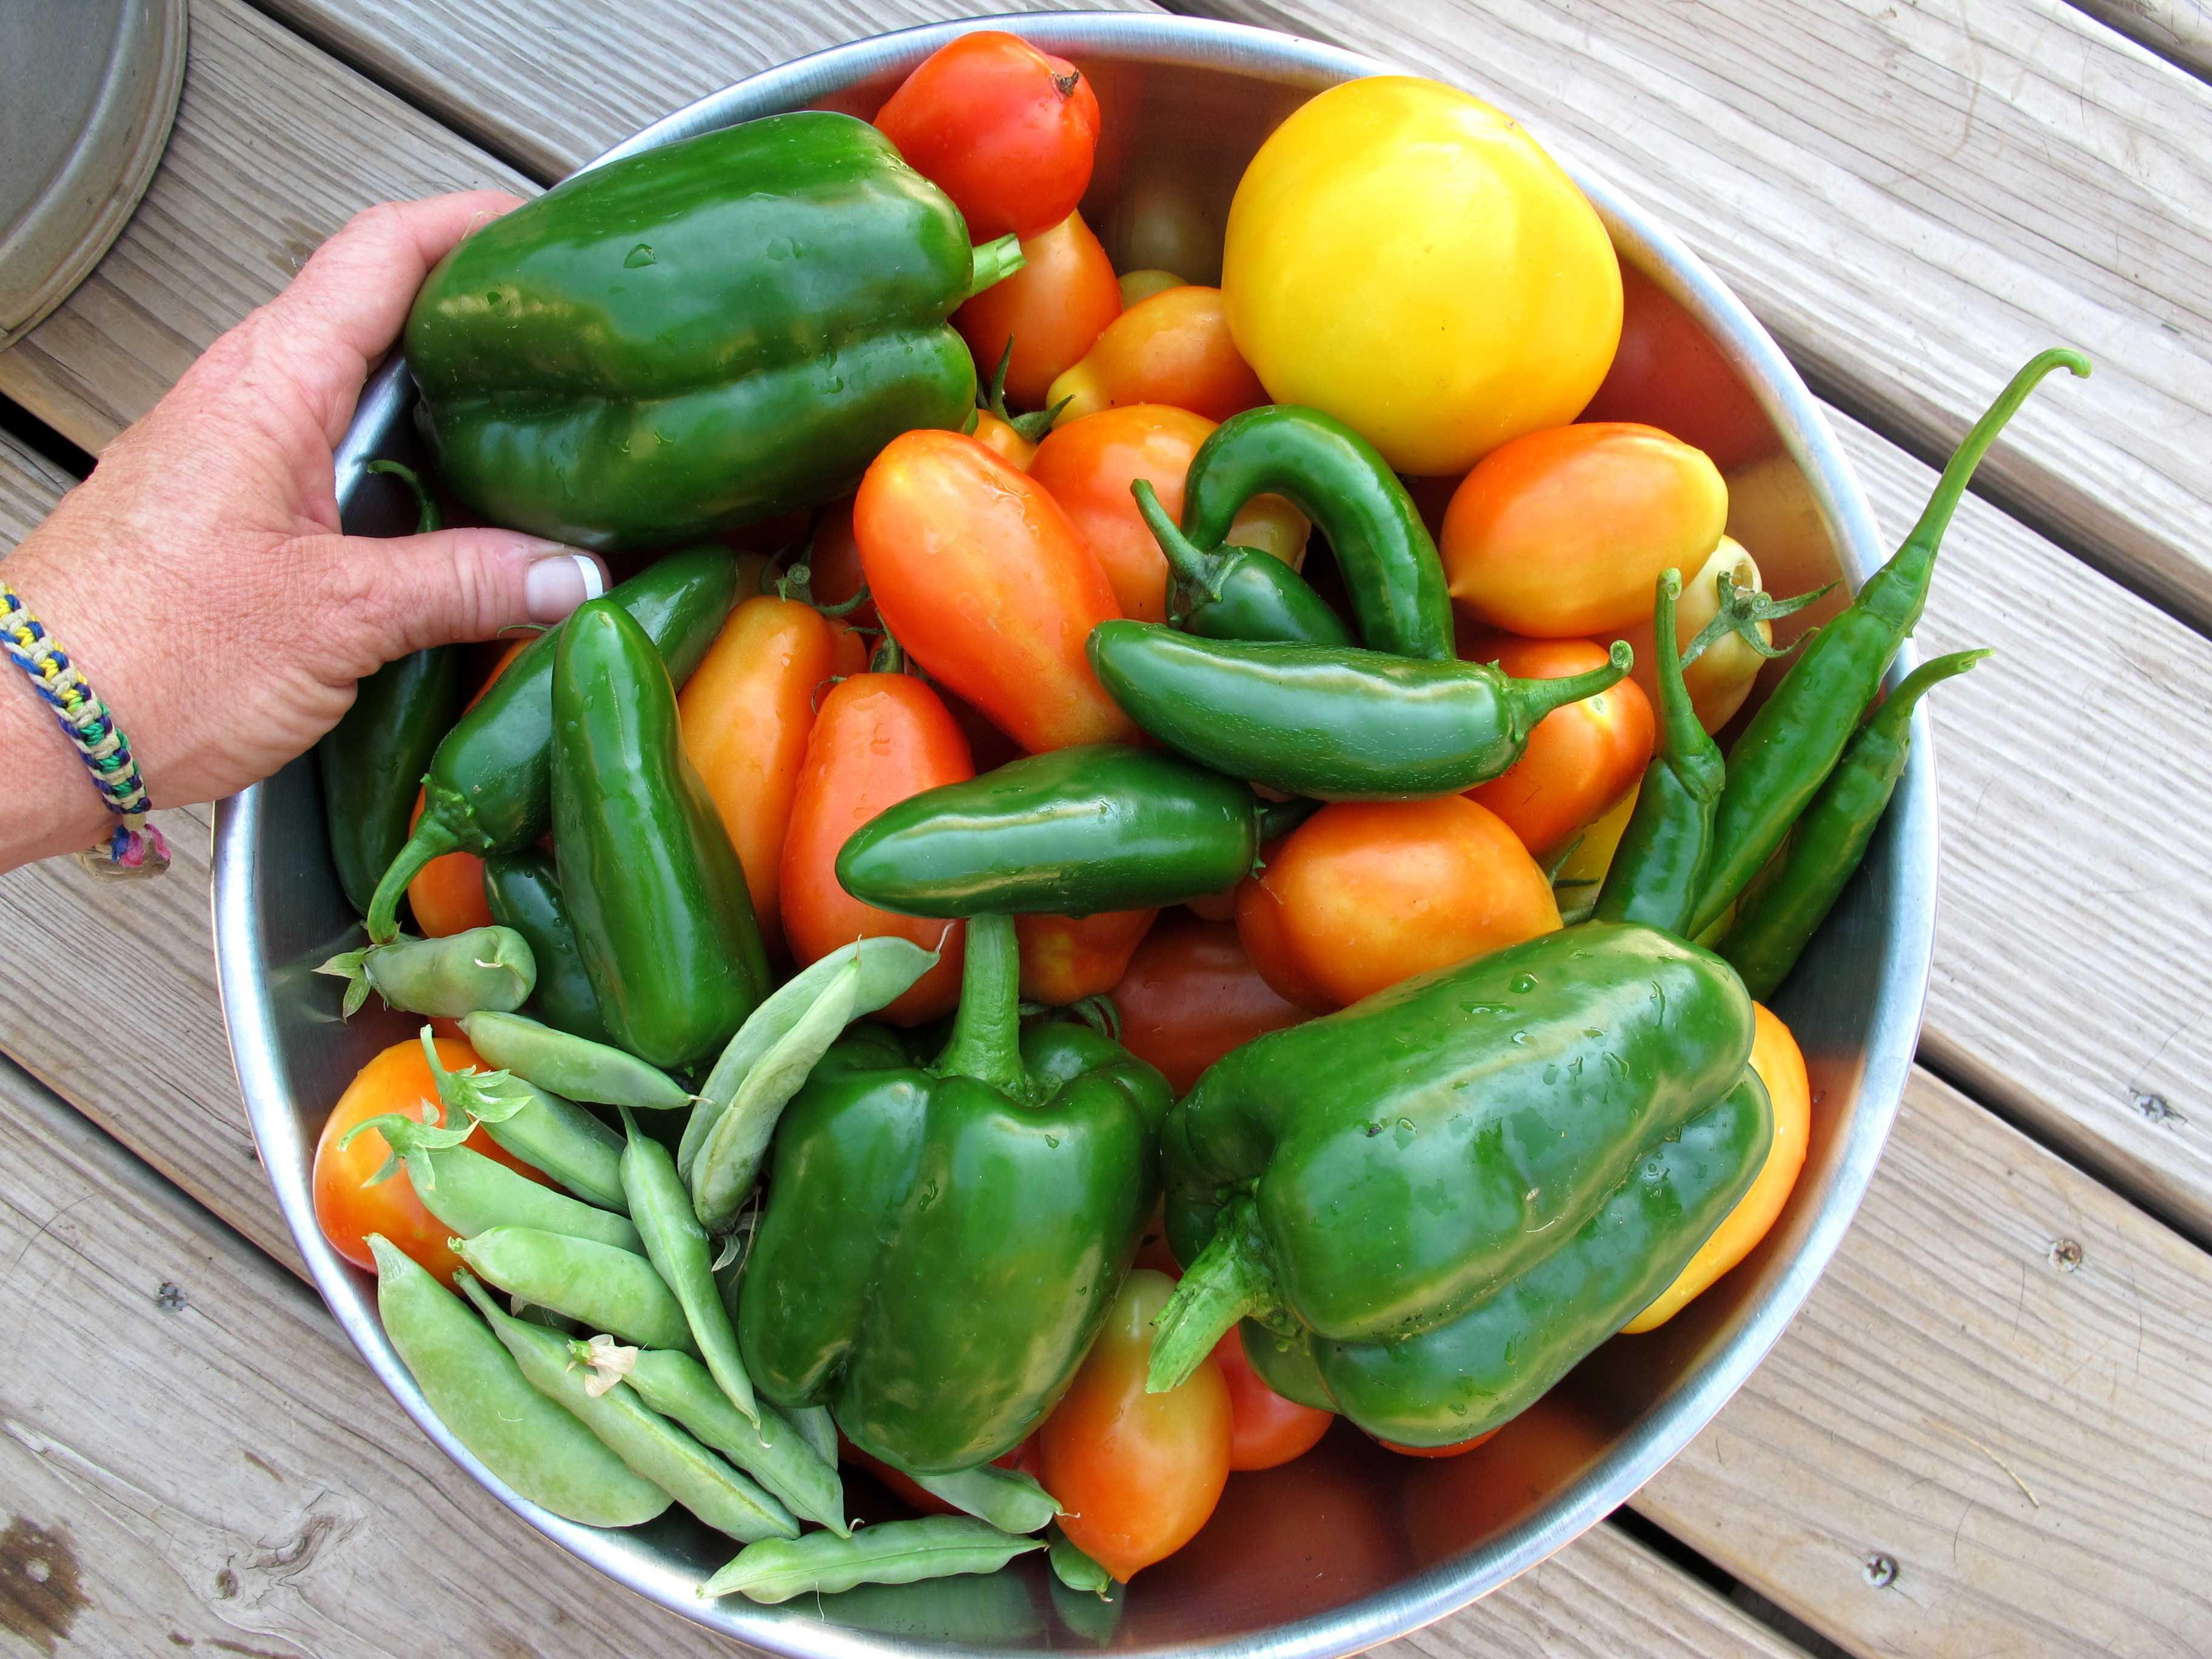 eat veggies and fruits